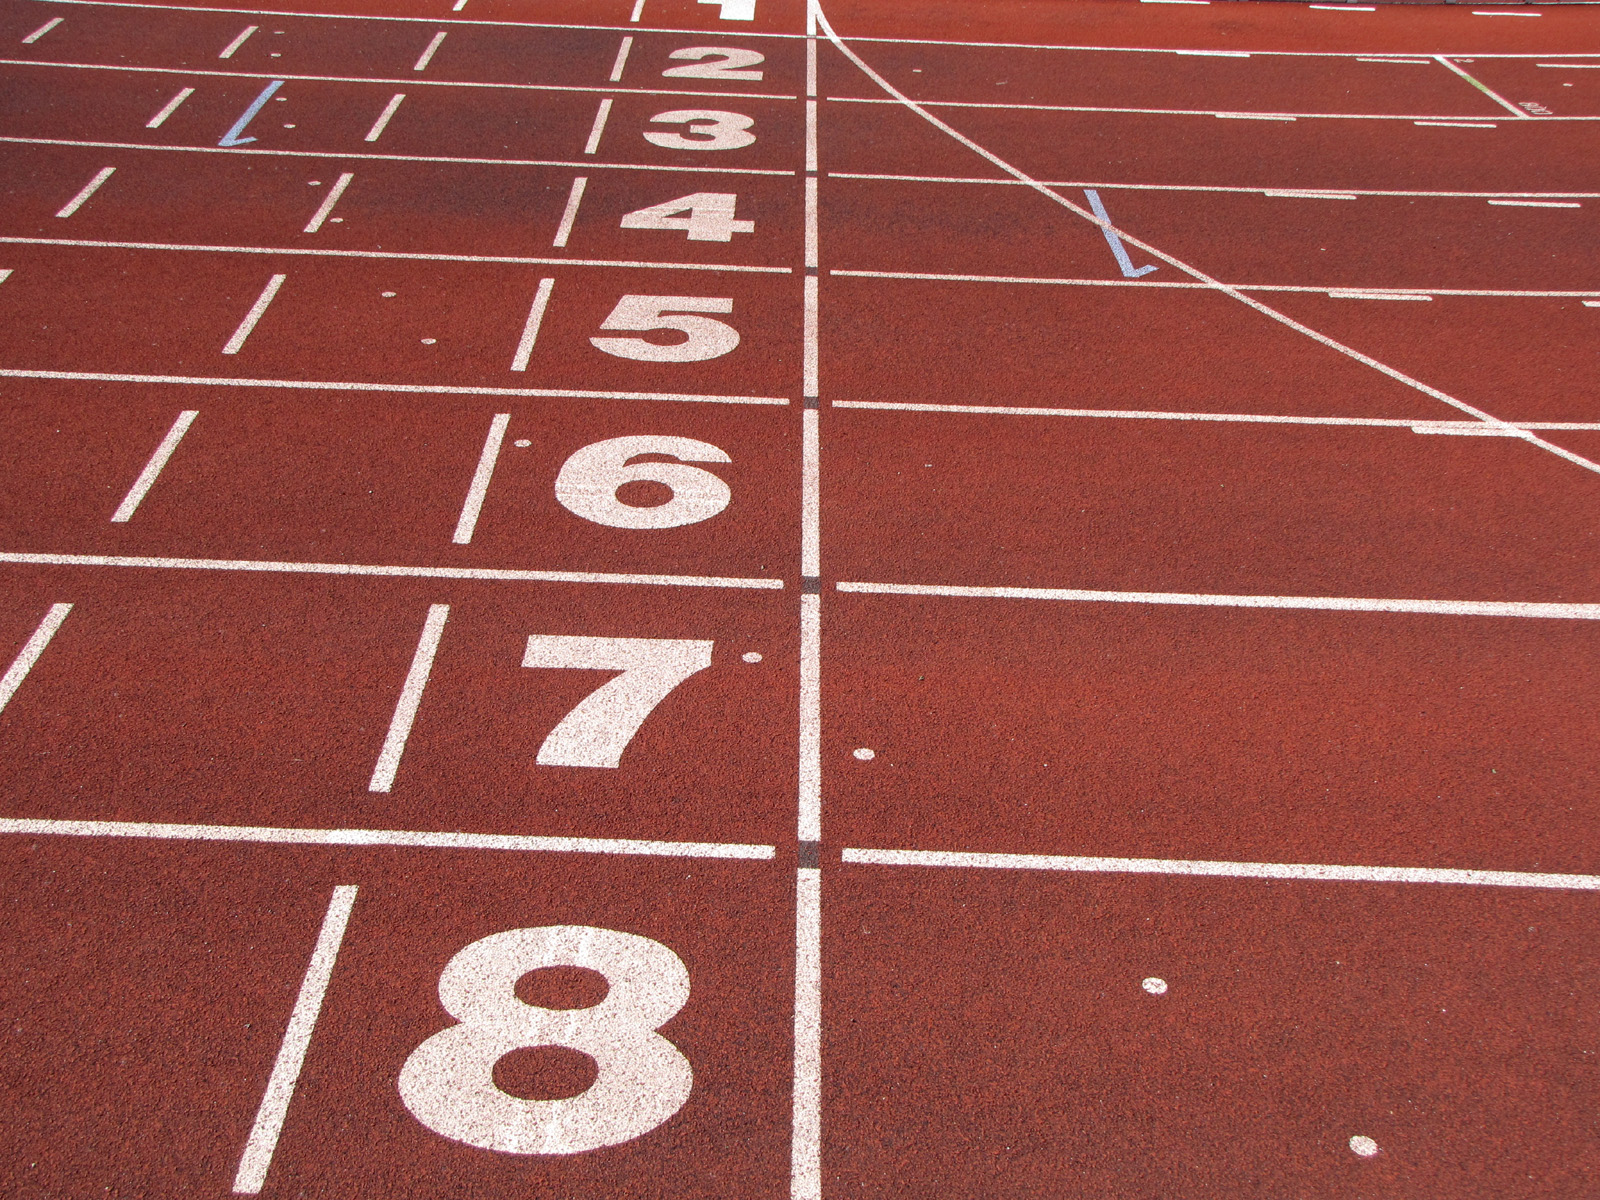 English: Athletics tracks finish line